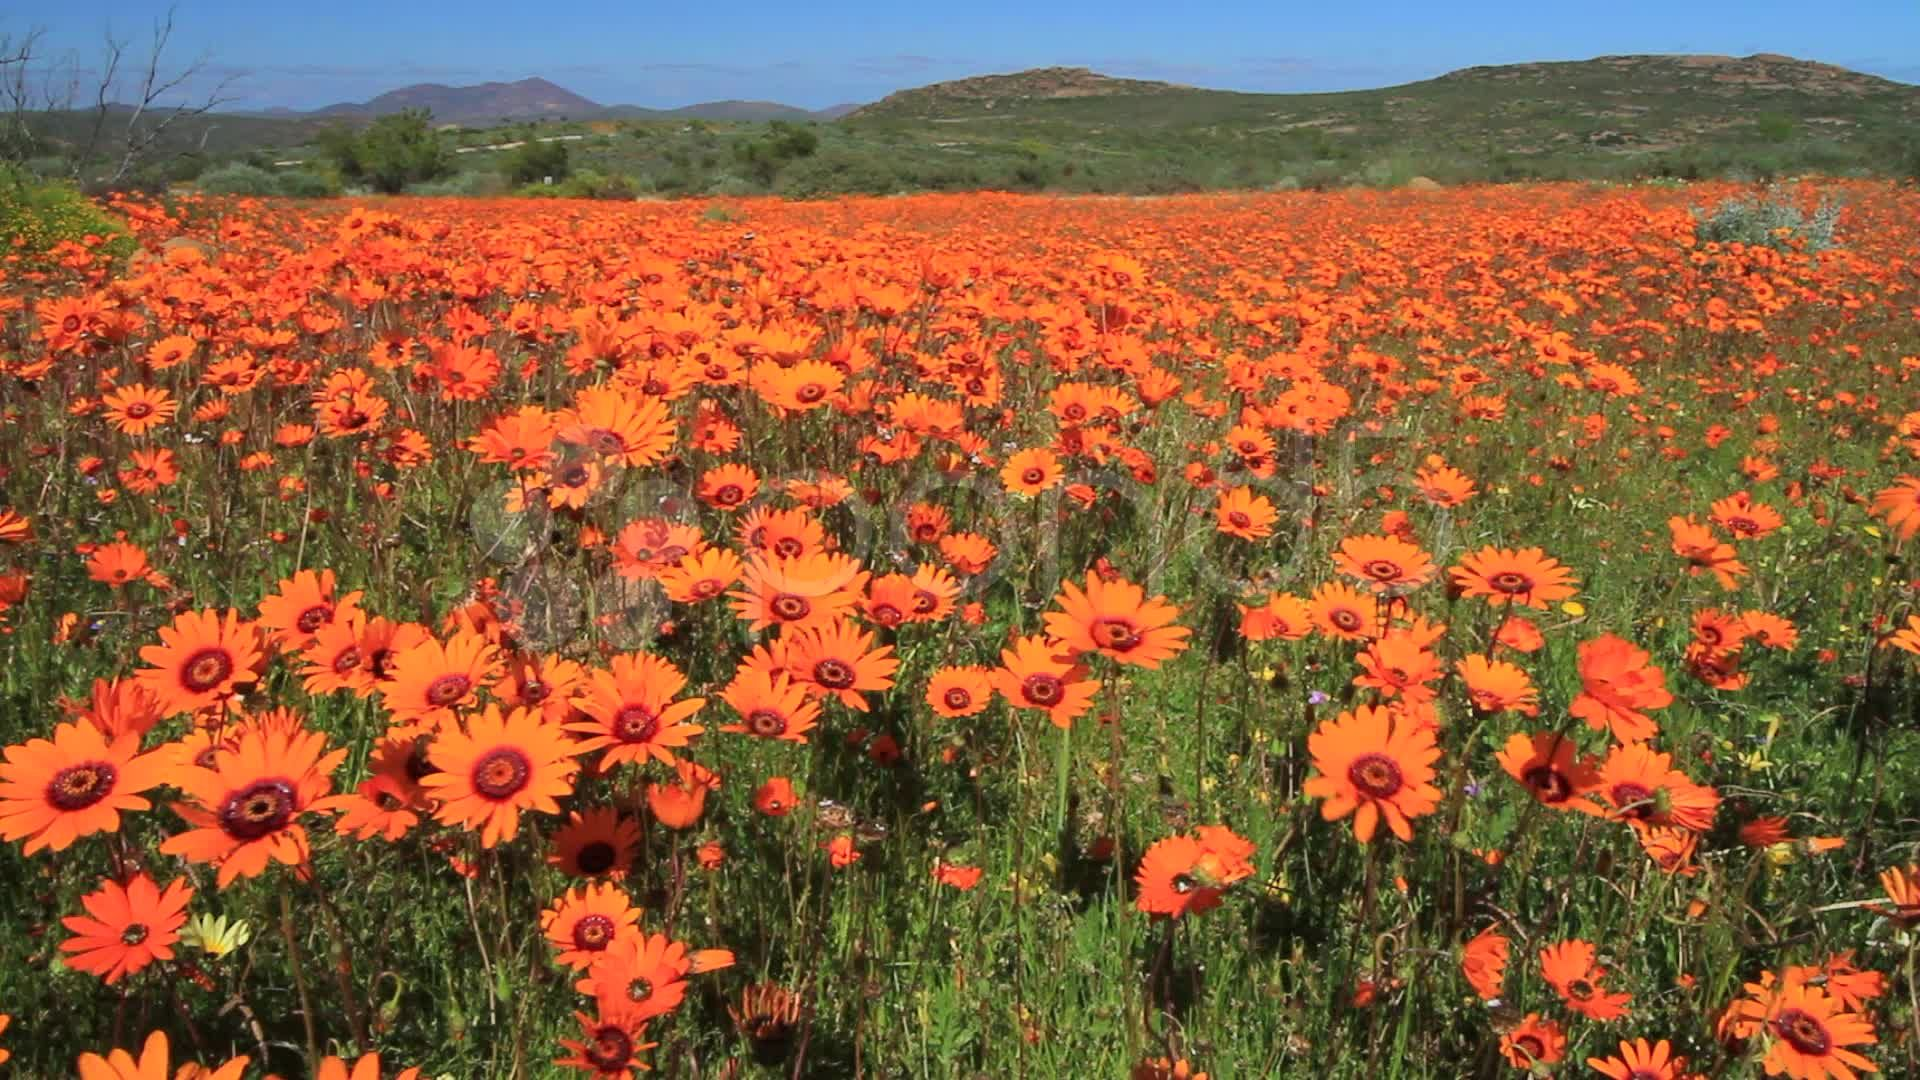 namaqualand-daisies-skilpad-valley-ws-footage-011144730 ...